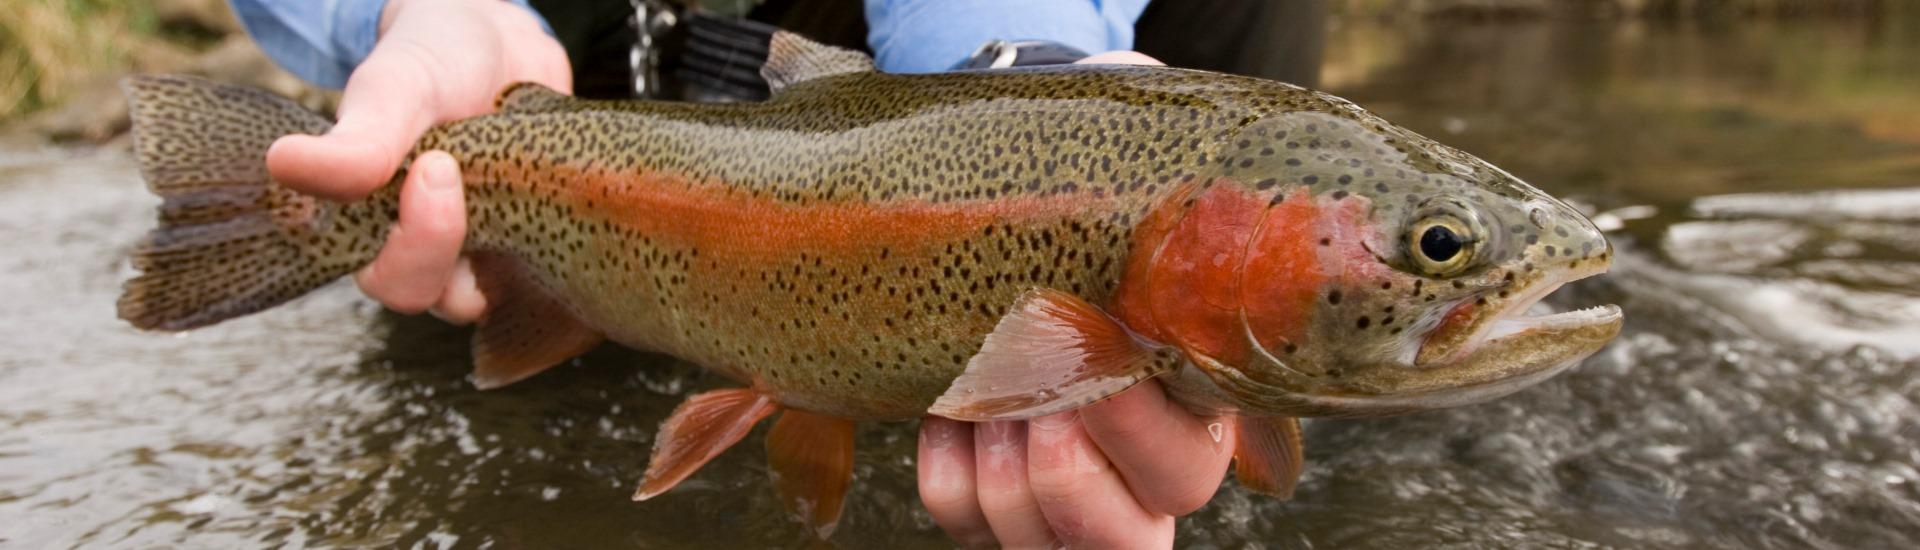 rainbow trout fish